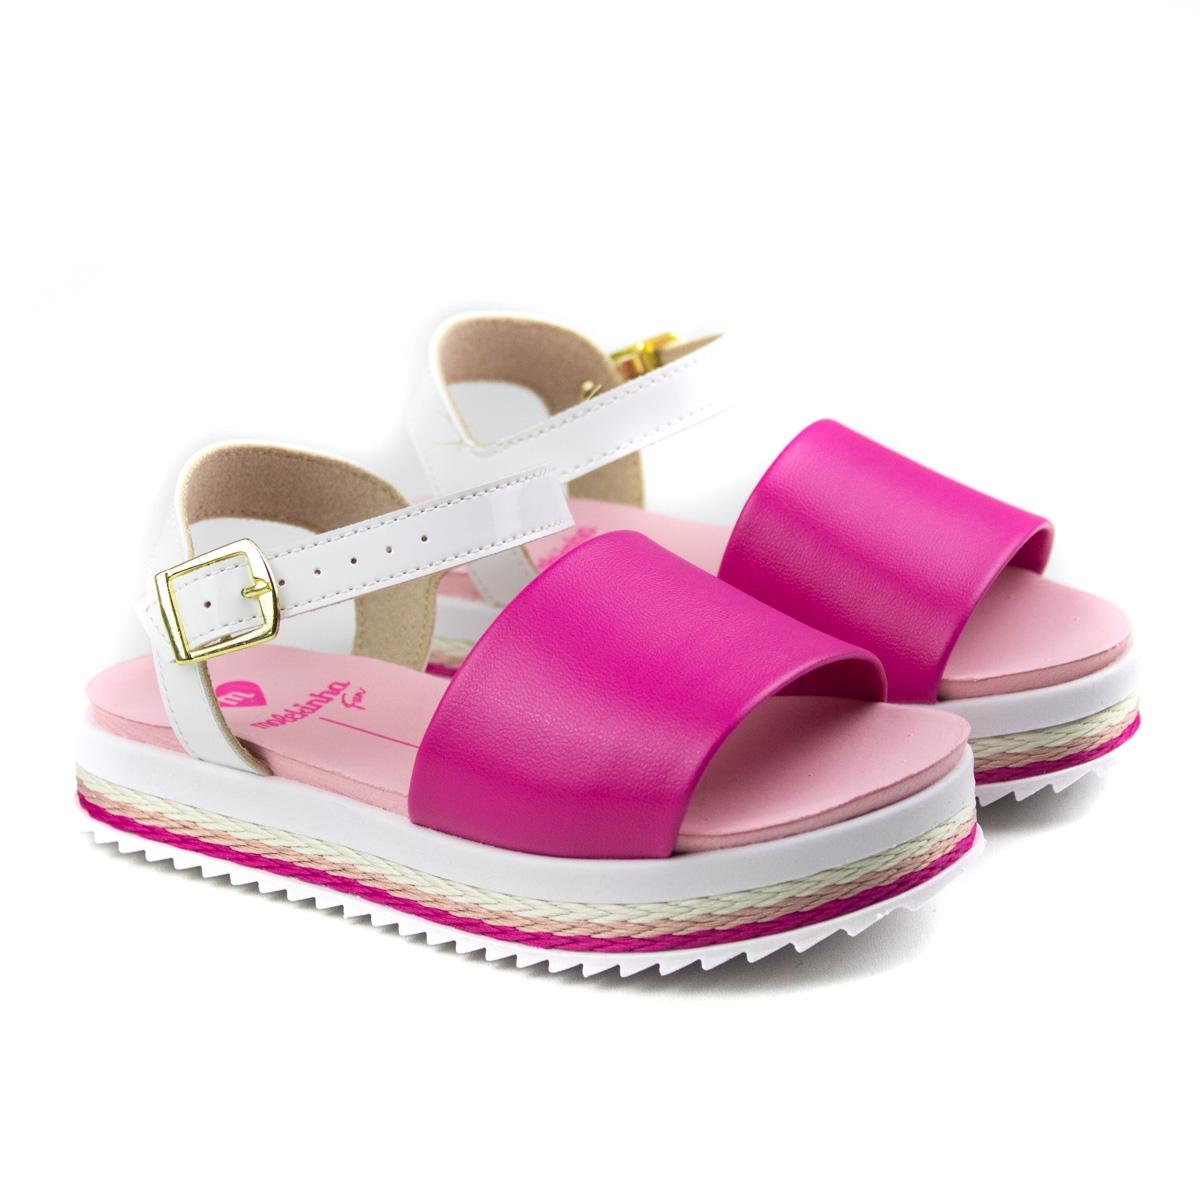 Sandália Infantil Feminina Molekinha Anabela - Pink/branco